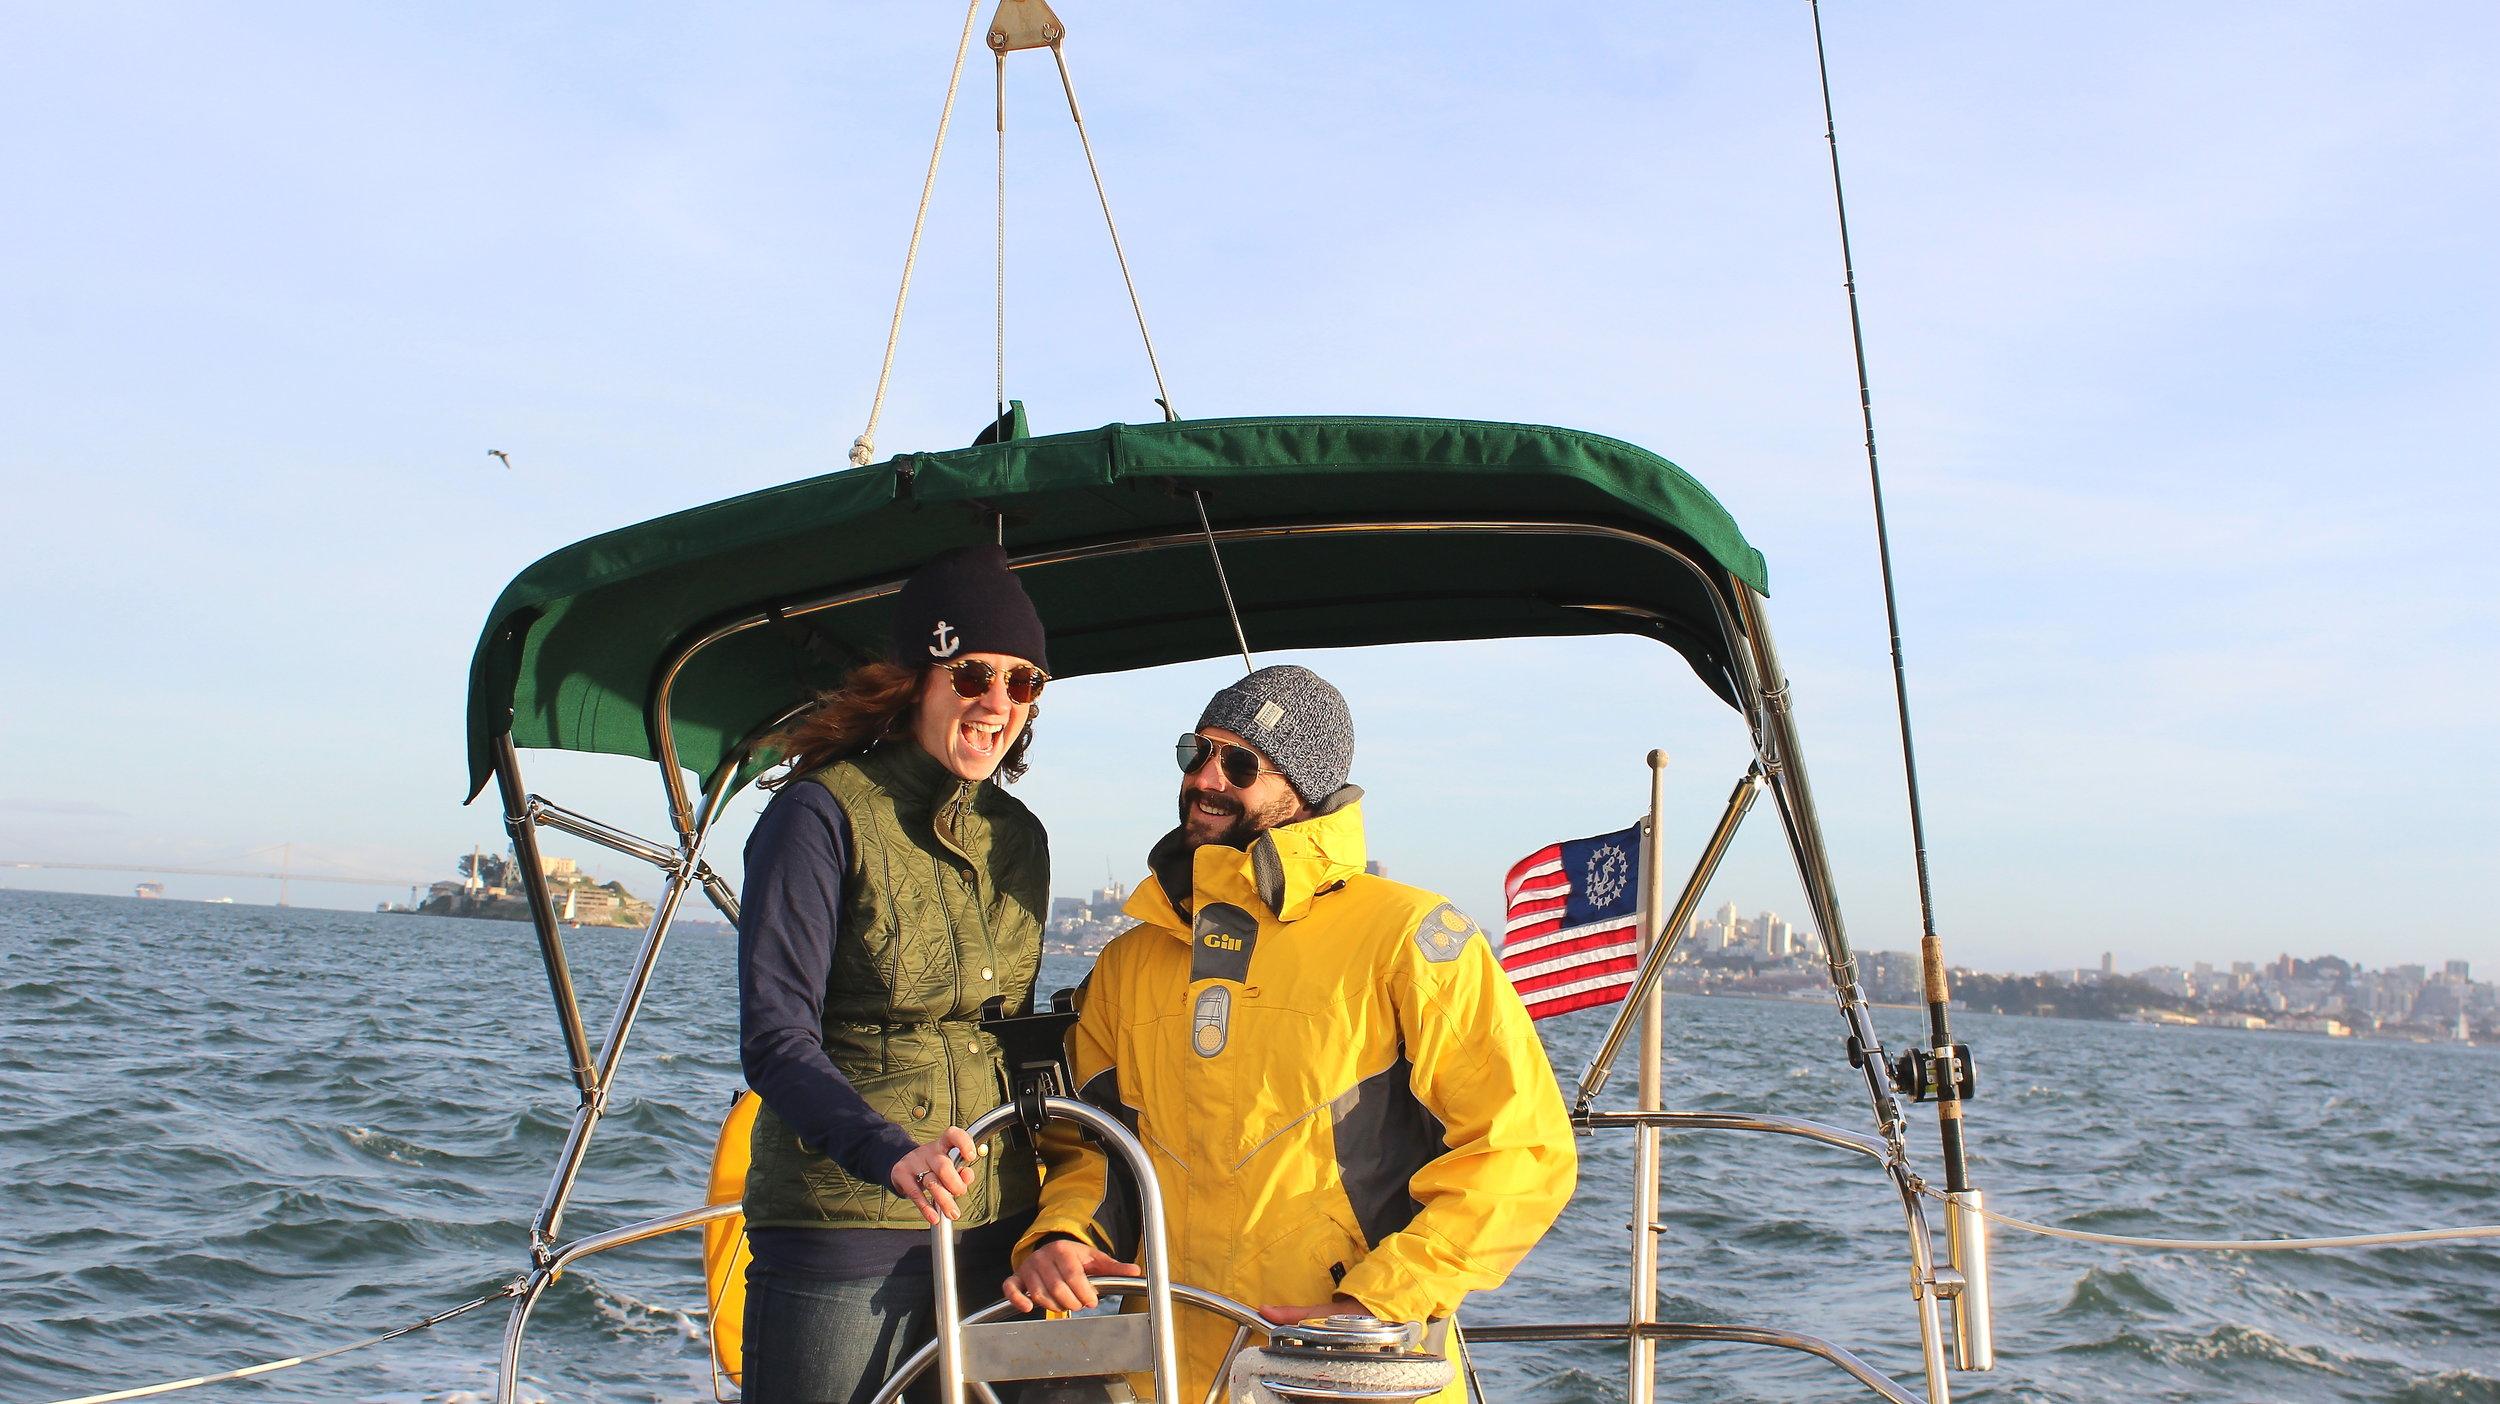 Thisldu sailing and travel blog